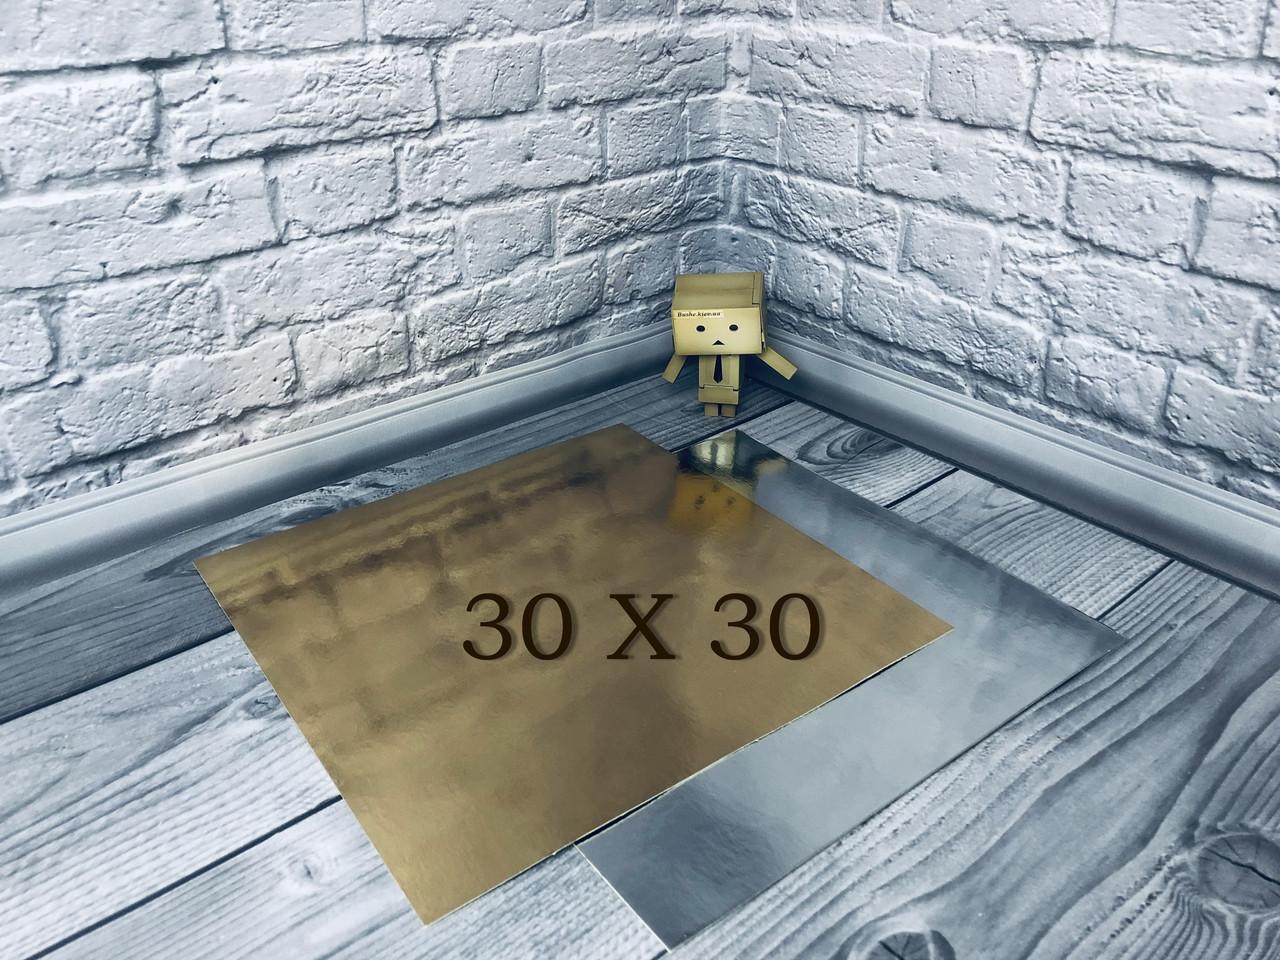 *10 шт* / Подложка для торта 30х30см, Золото-серебро, 300х300мм/мин. 10 шт.